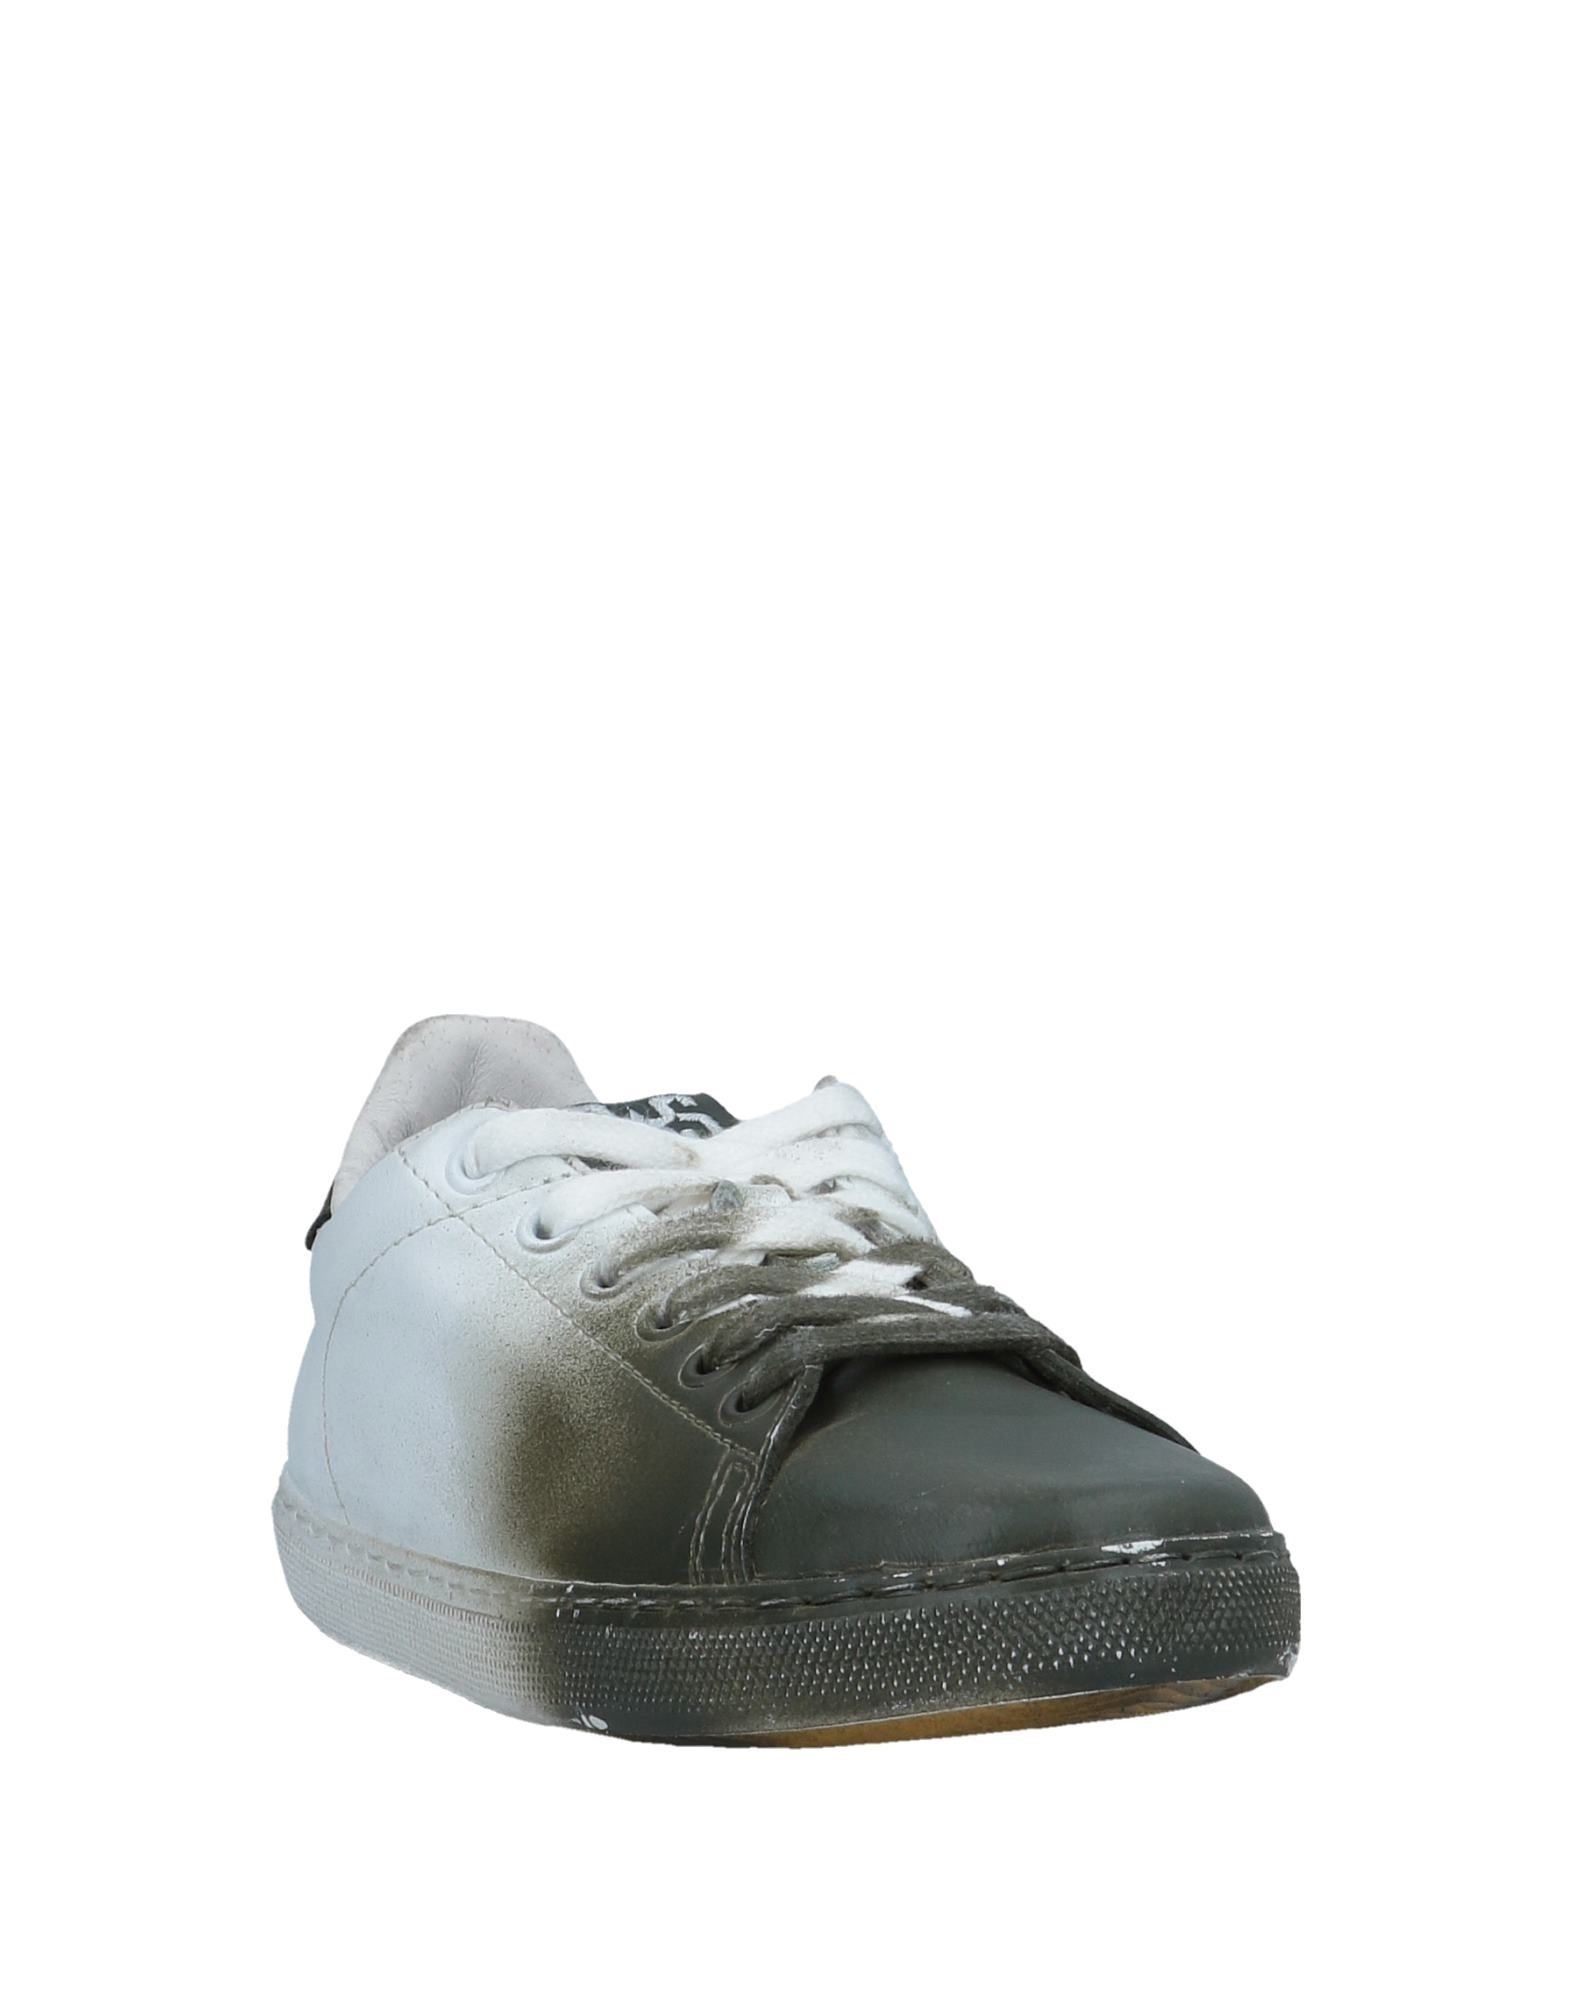 2Star White Boys Shoes